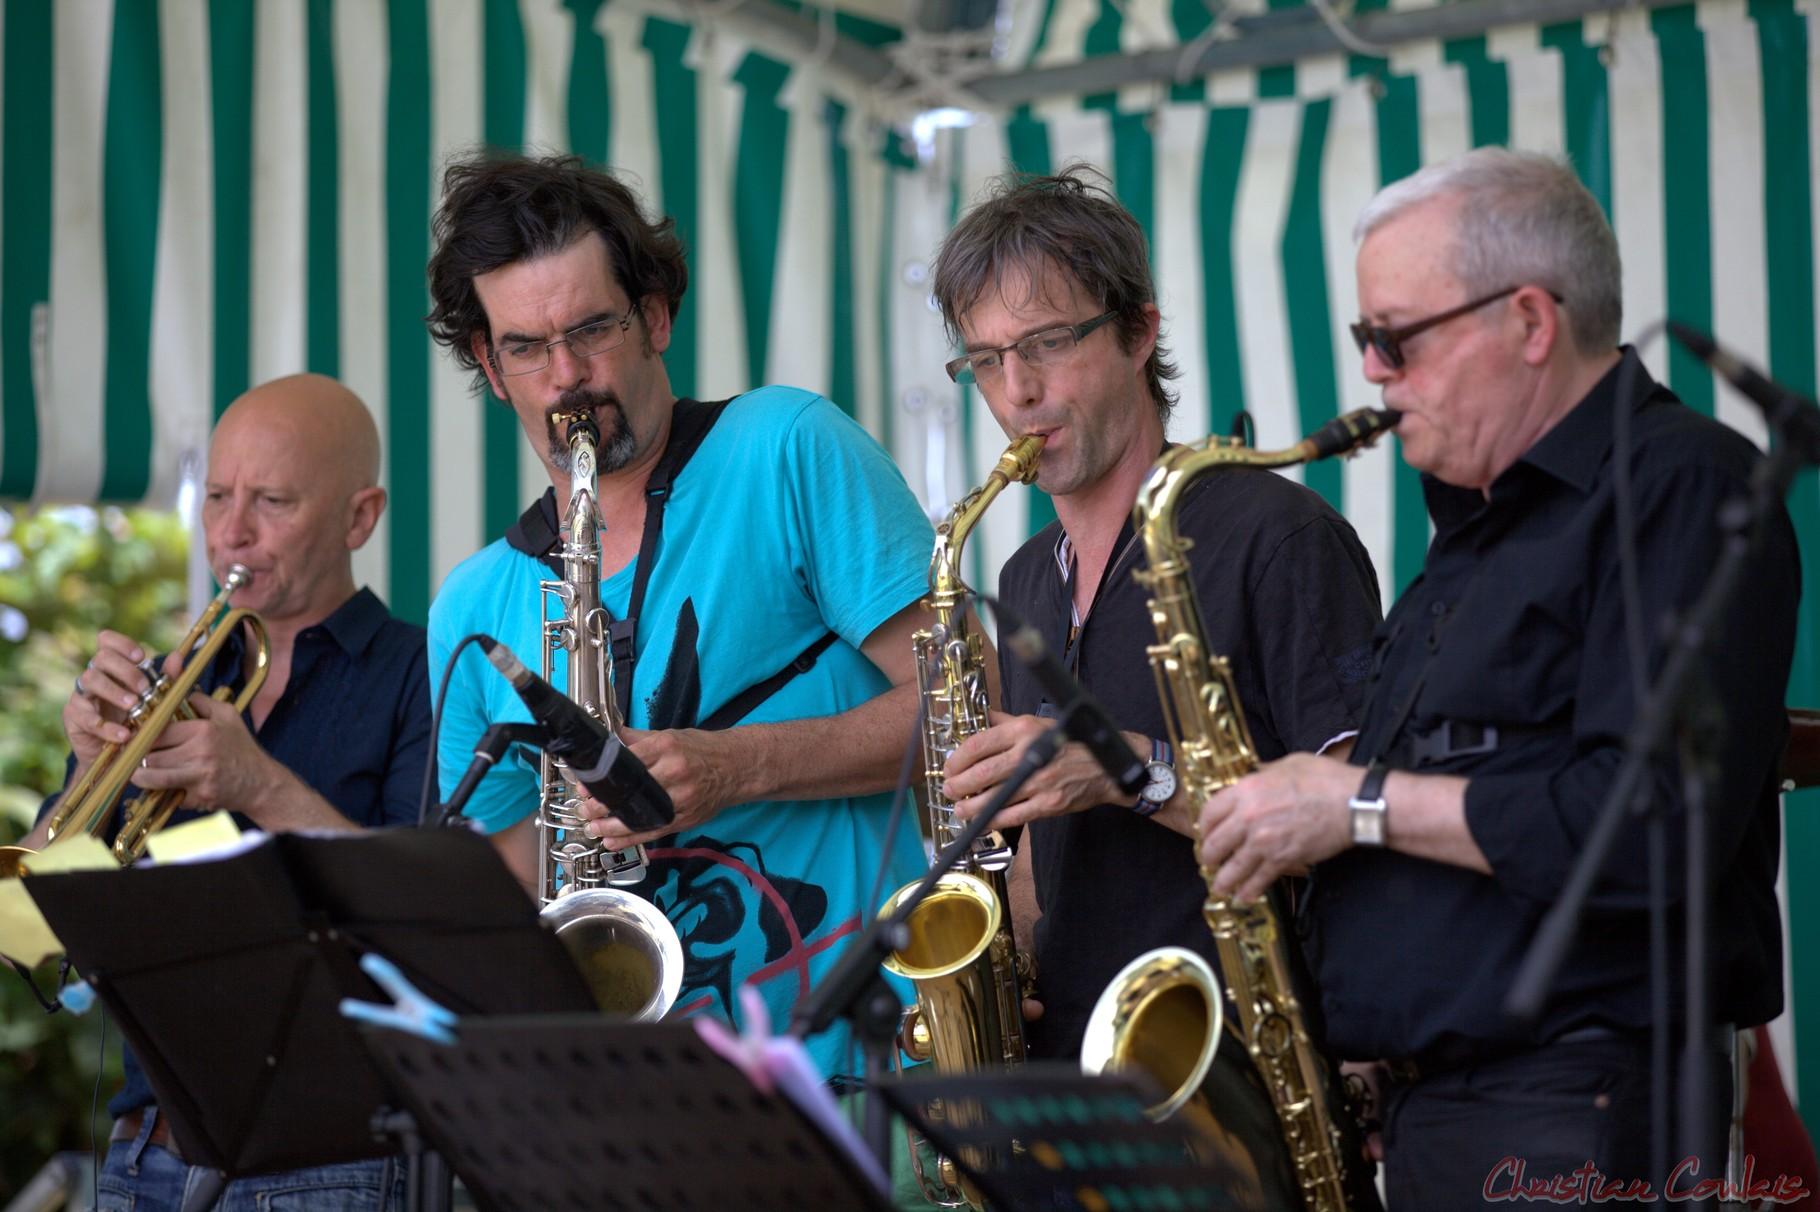 Festival JAZZ360 2014, Alain Duffort, Thierry Taveaux, Grat Martinez, Rémy Brown, Jazzméléon Trafic, Cénac